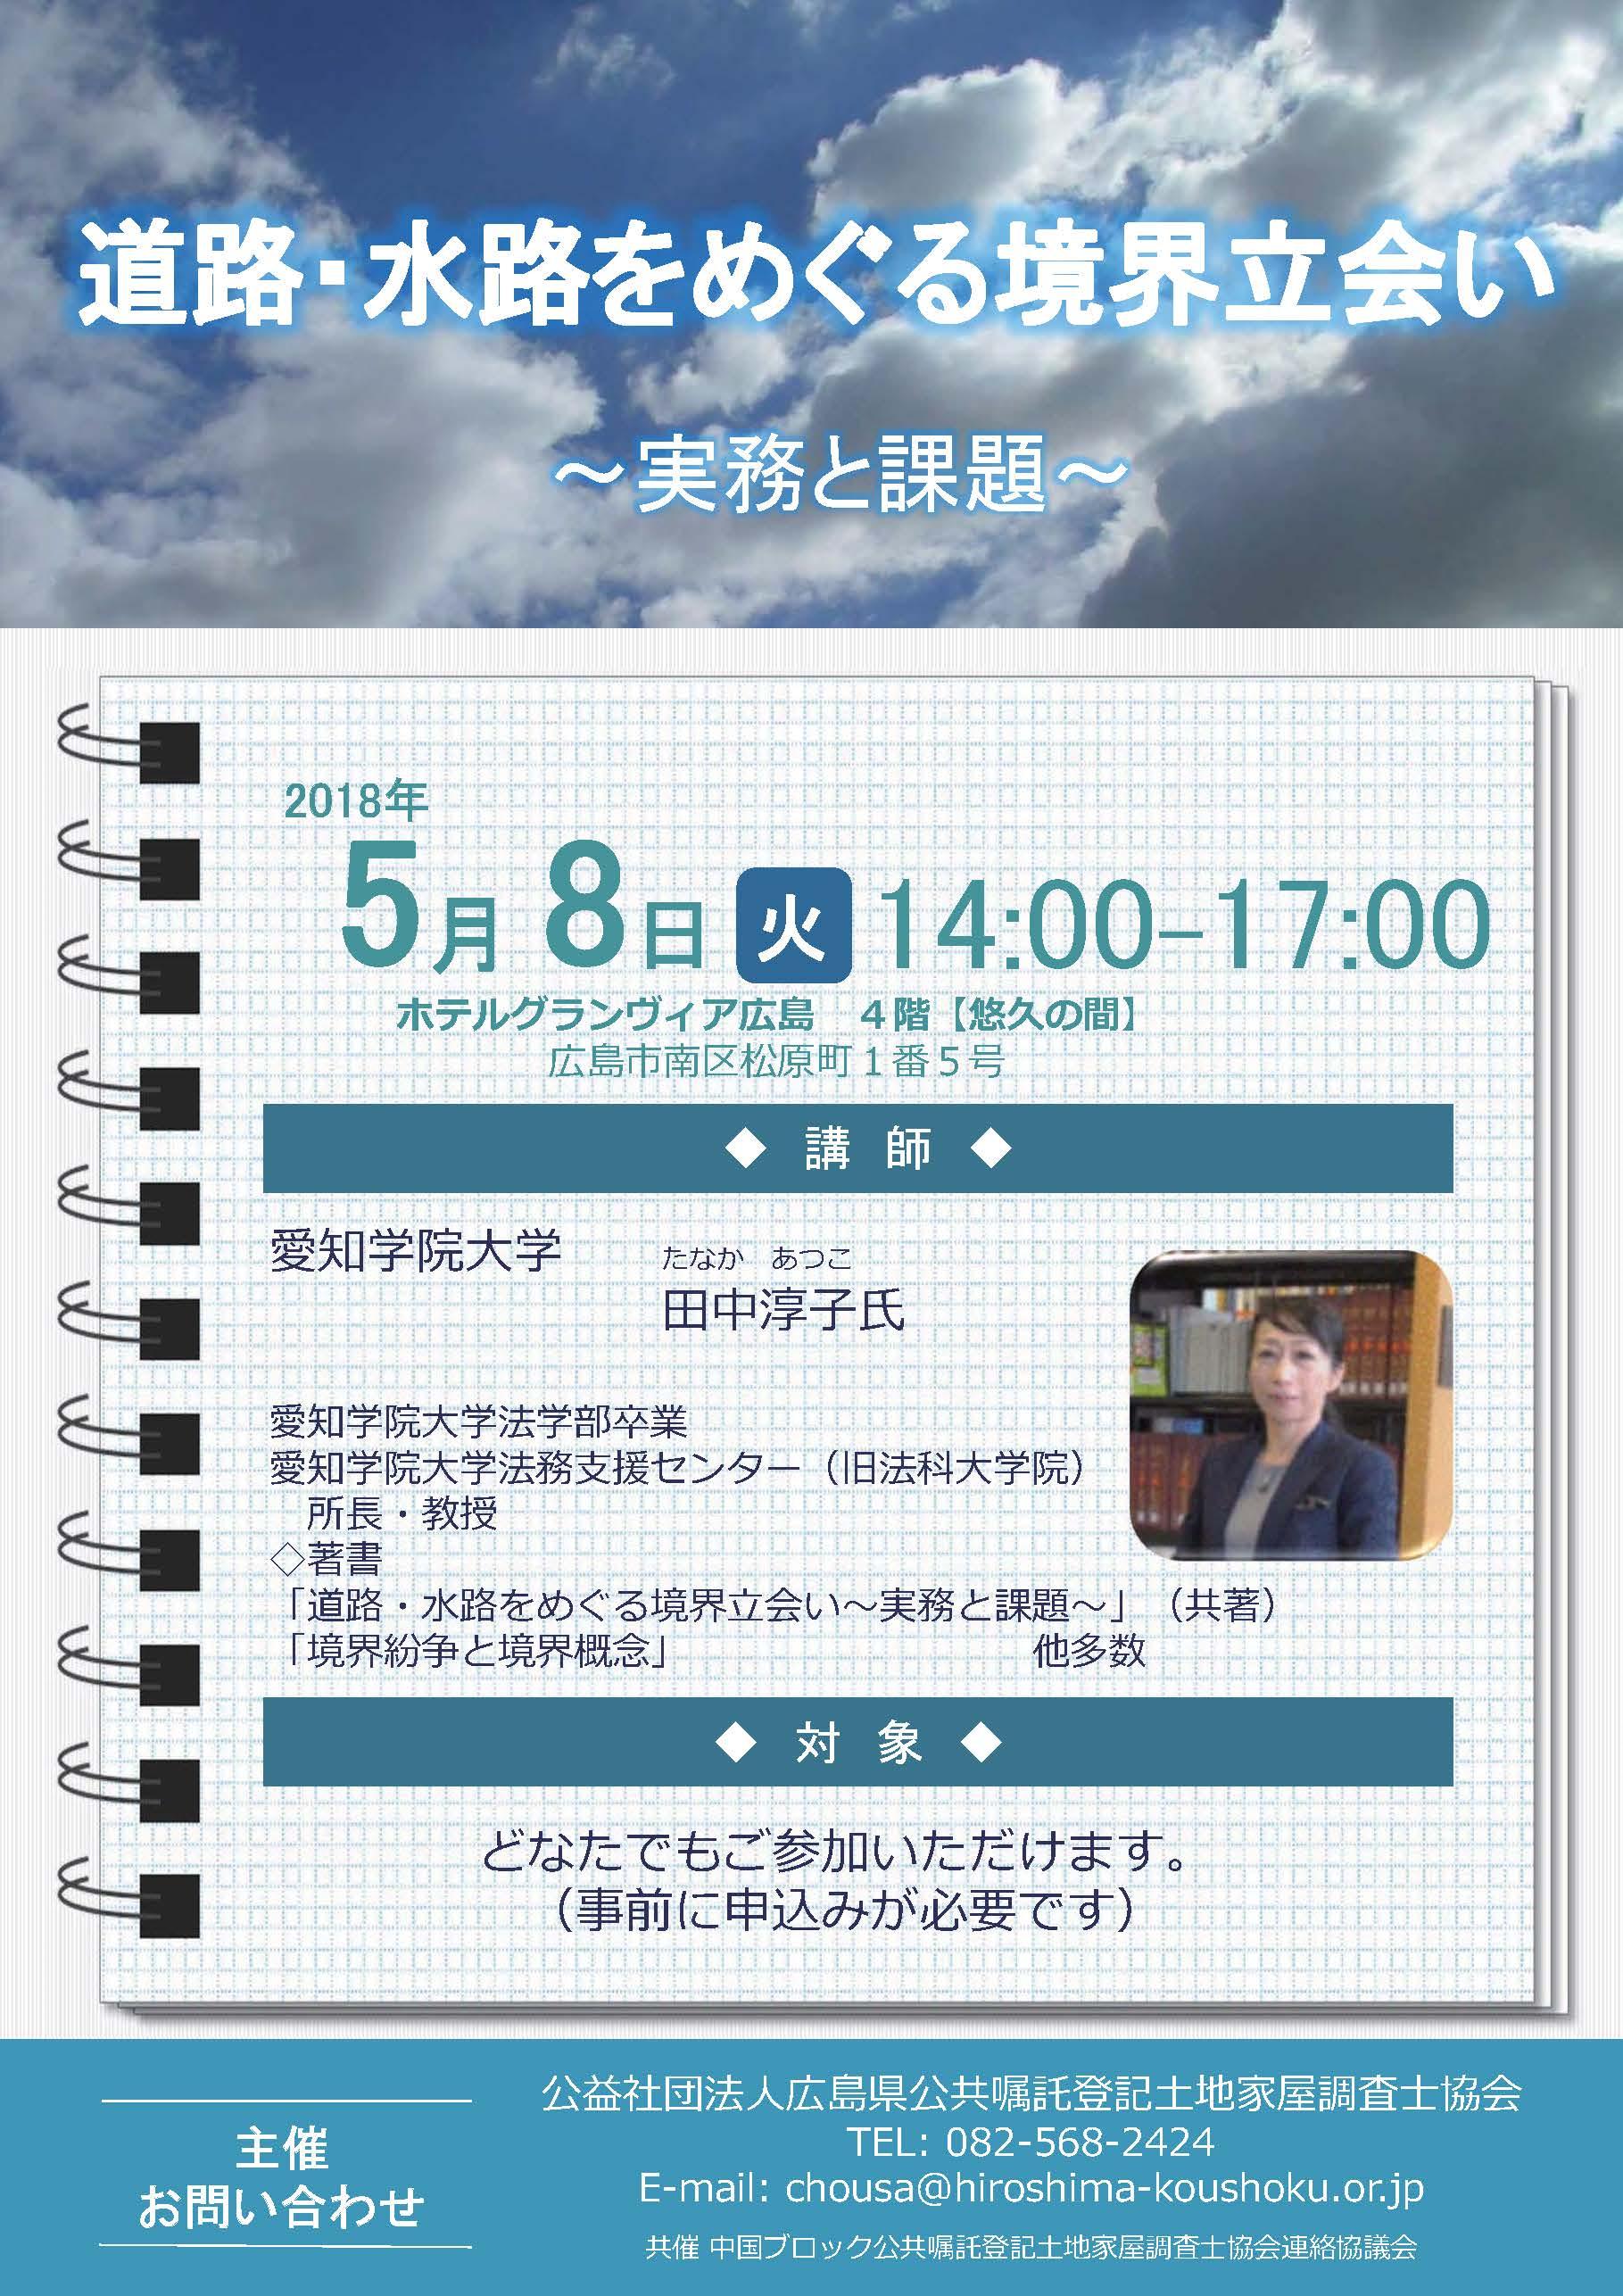 40043 HPチラシ【開催案内(関係各位)】20180508講演会